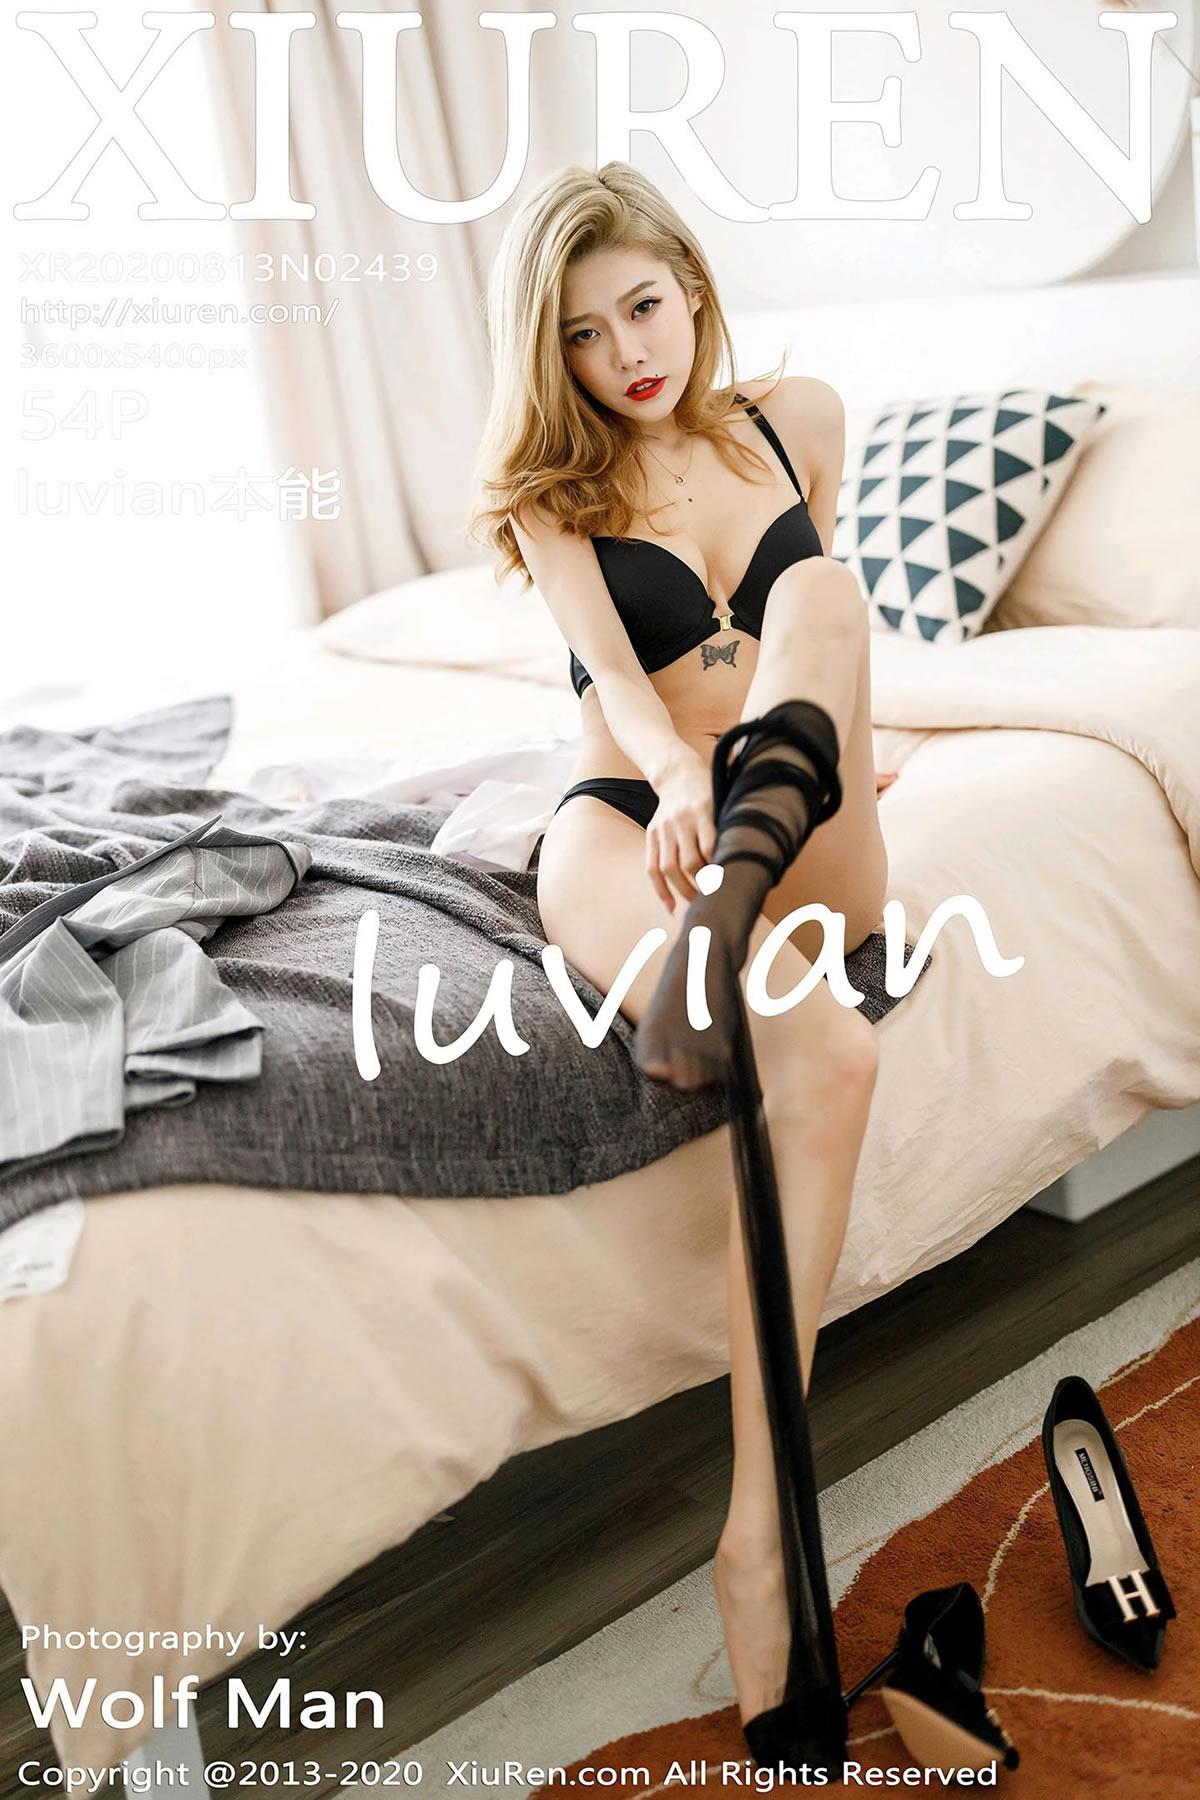 luvian本能(Vol. 2439) 性感mm-第1张